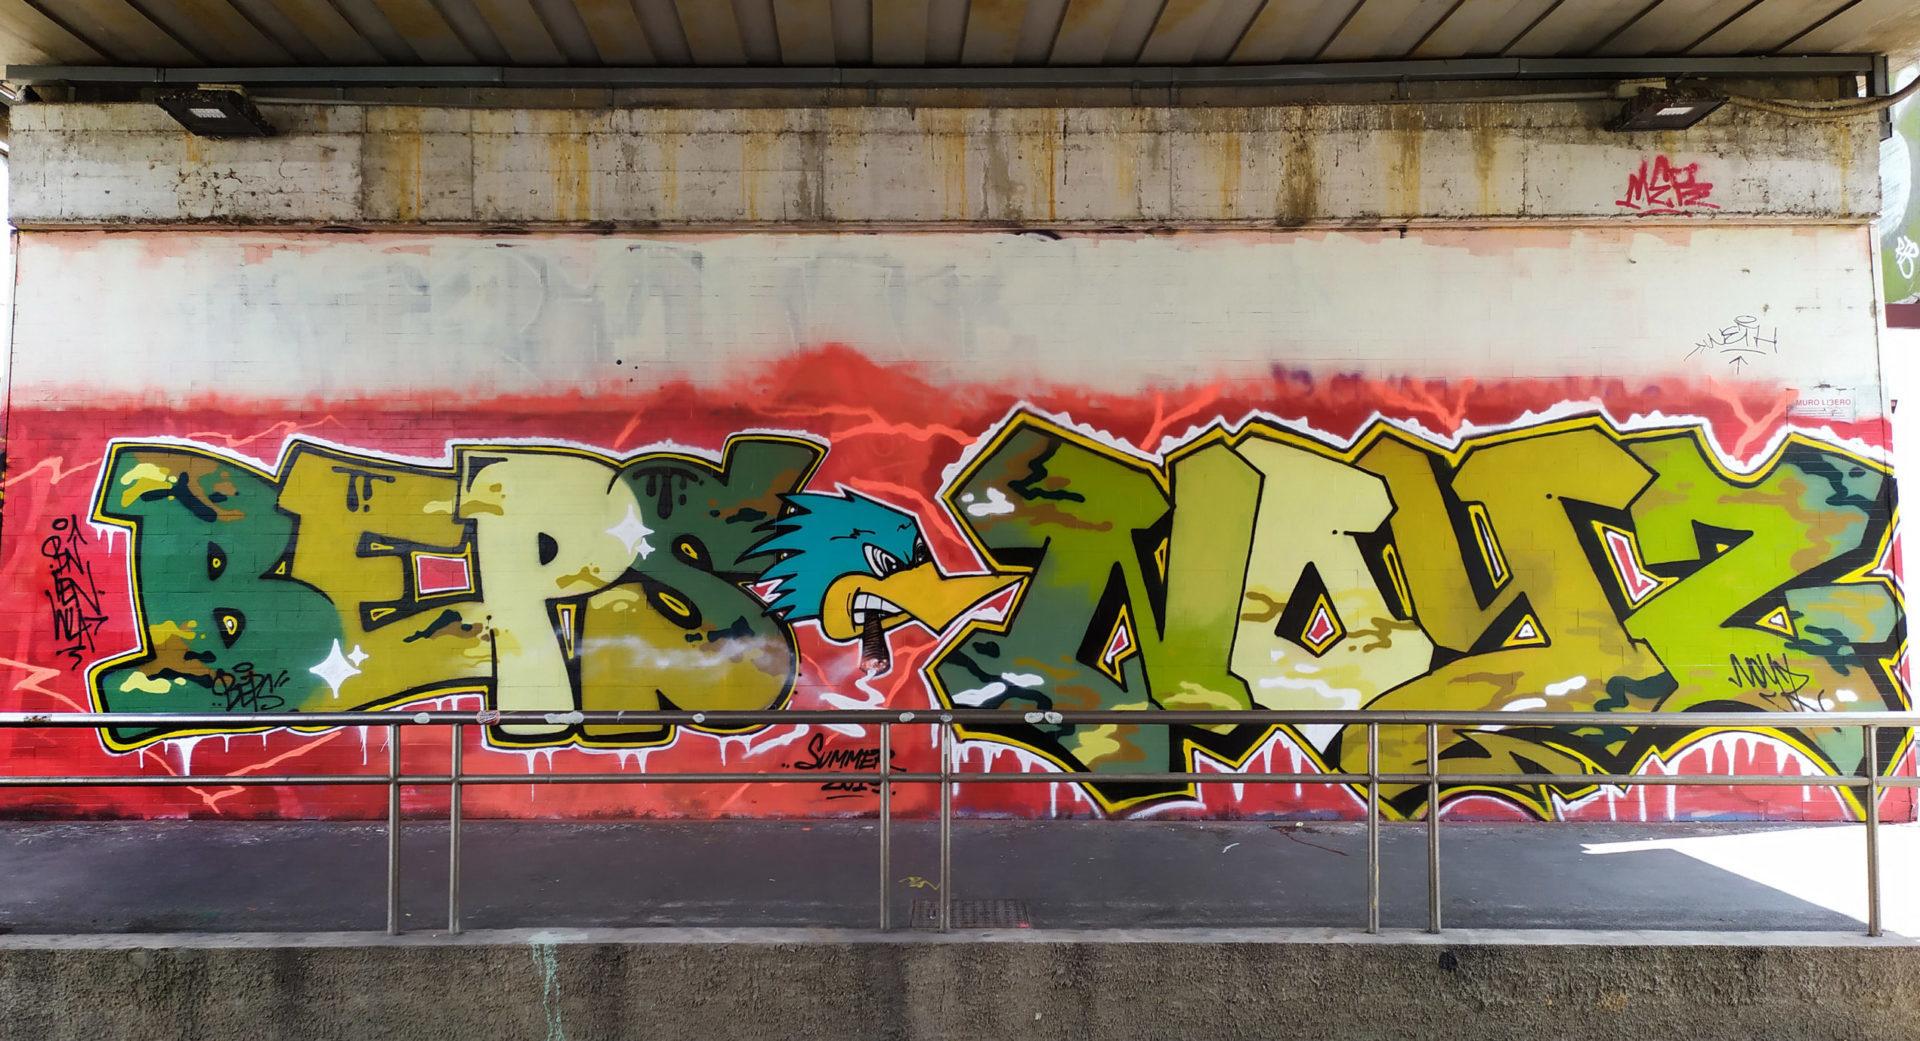 Beps + Noyz